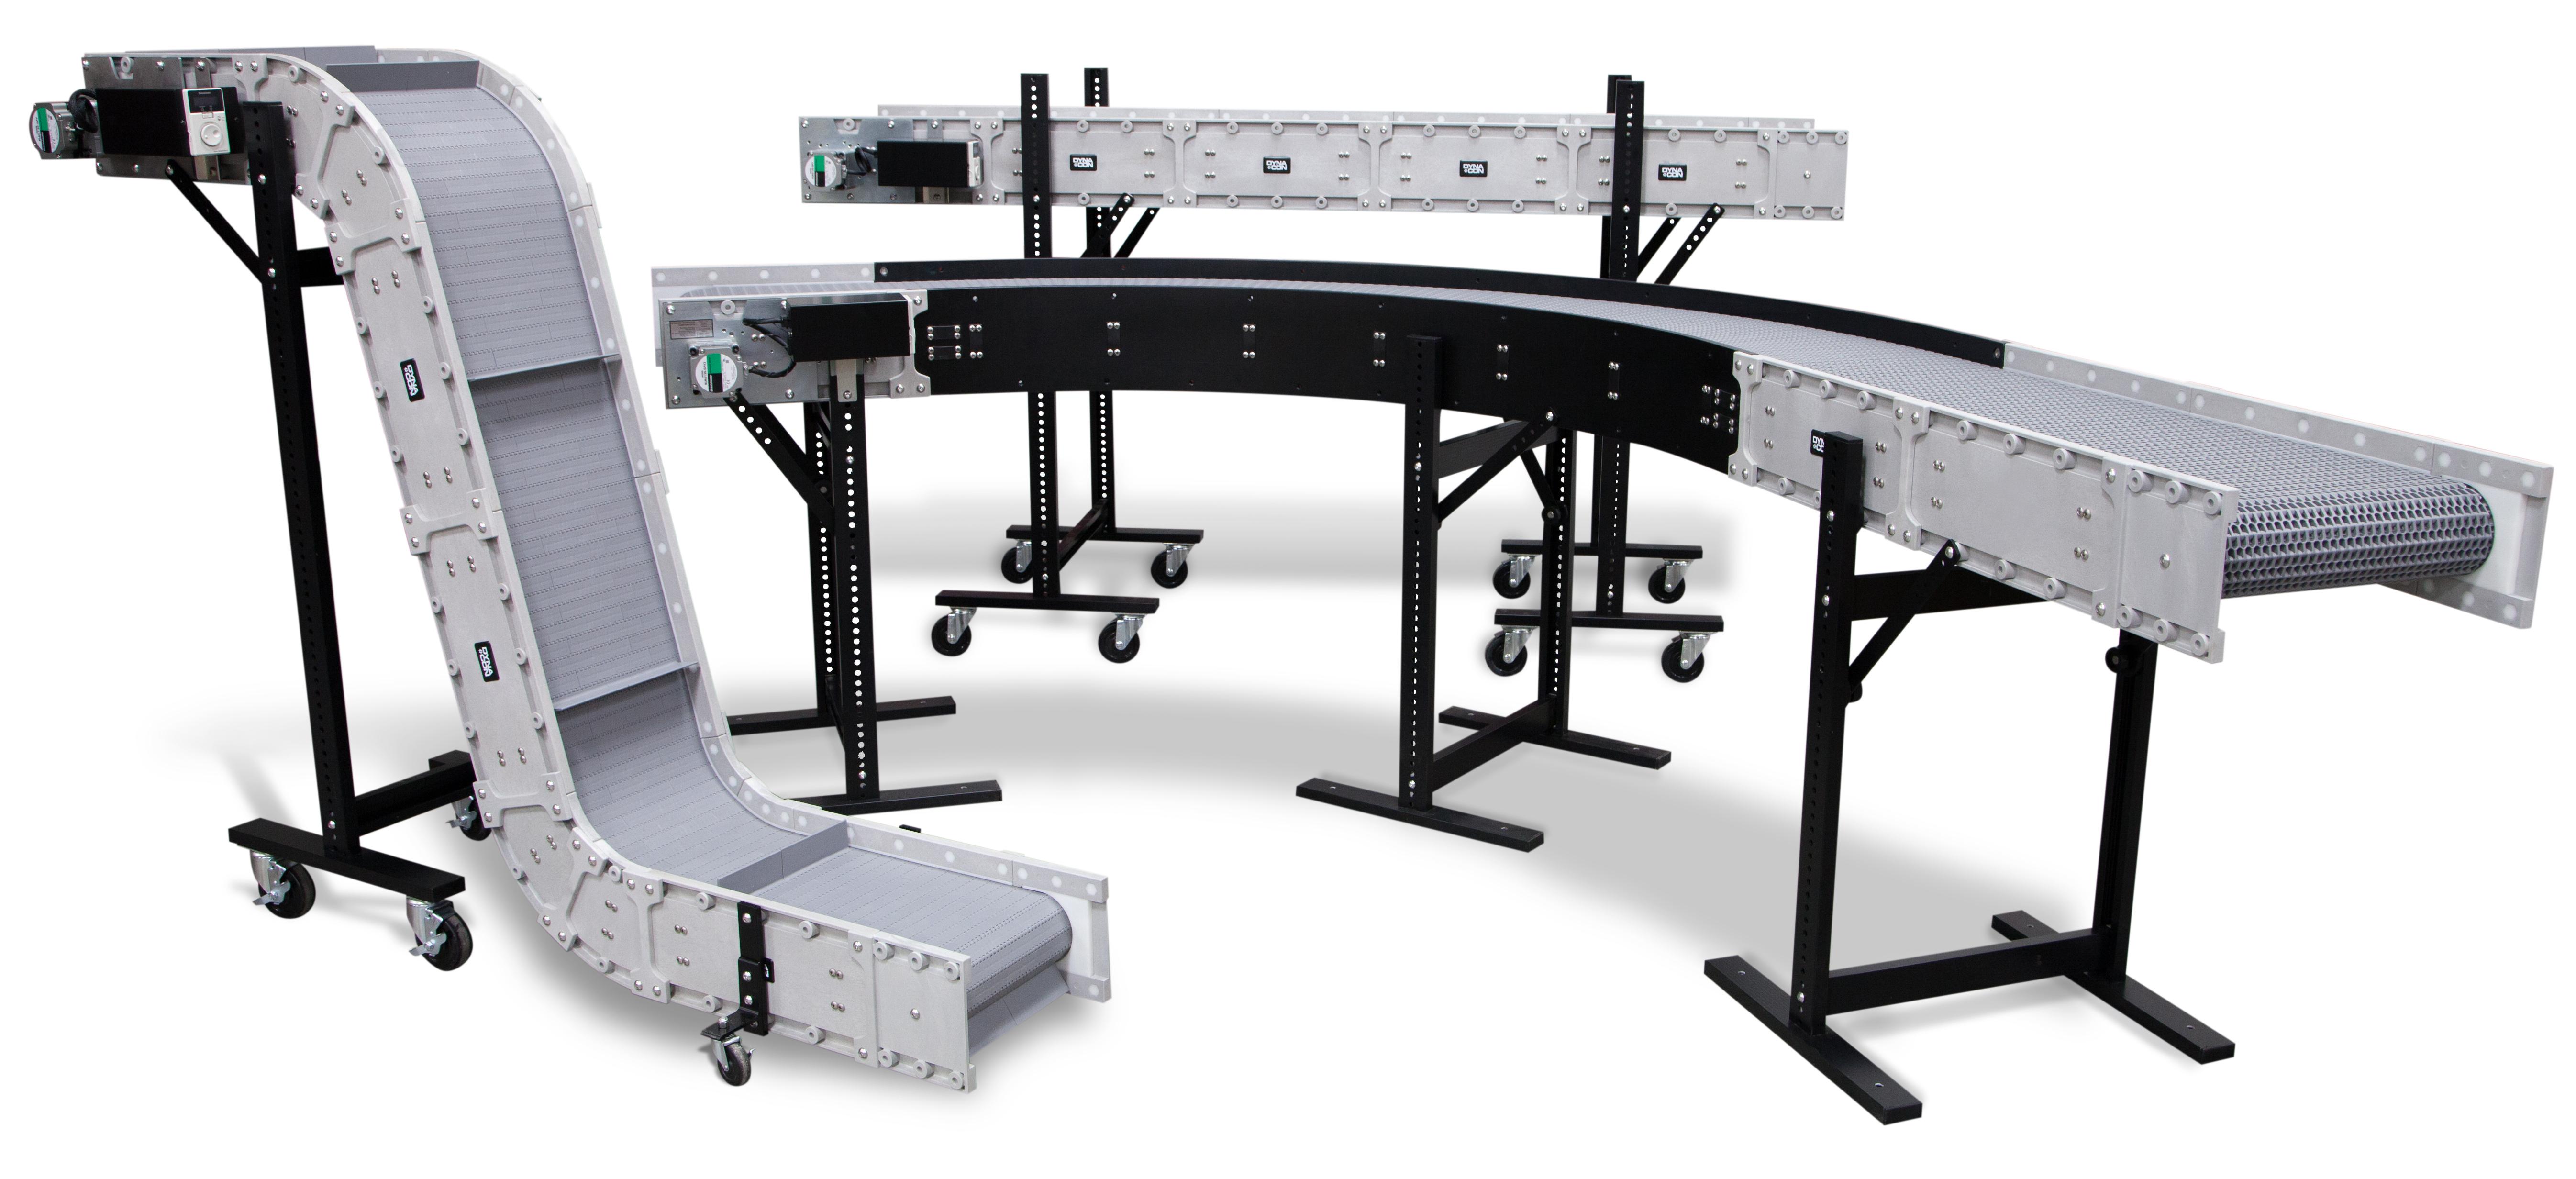 Reconfigurable Conveyors